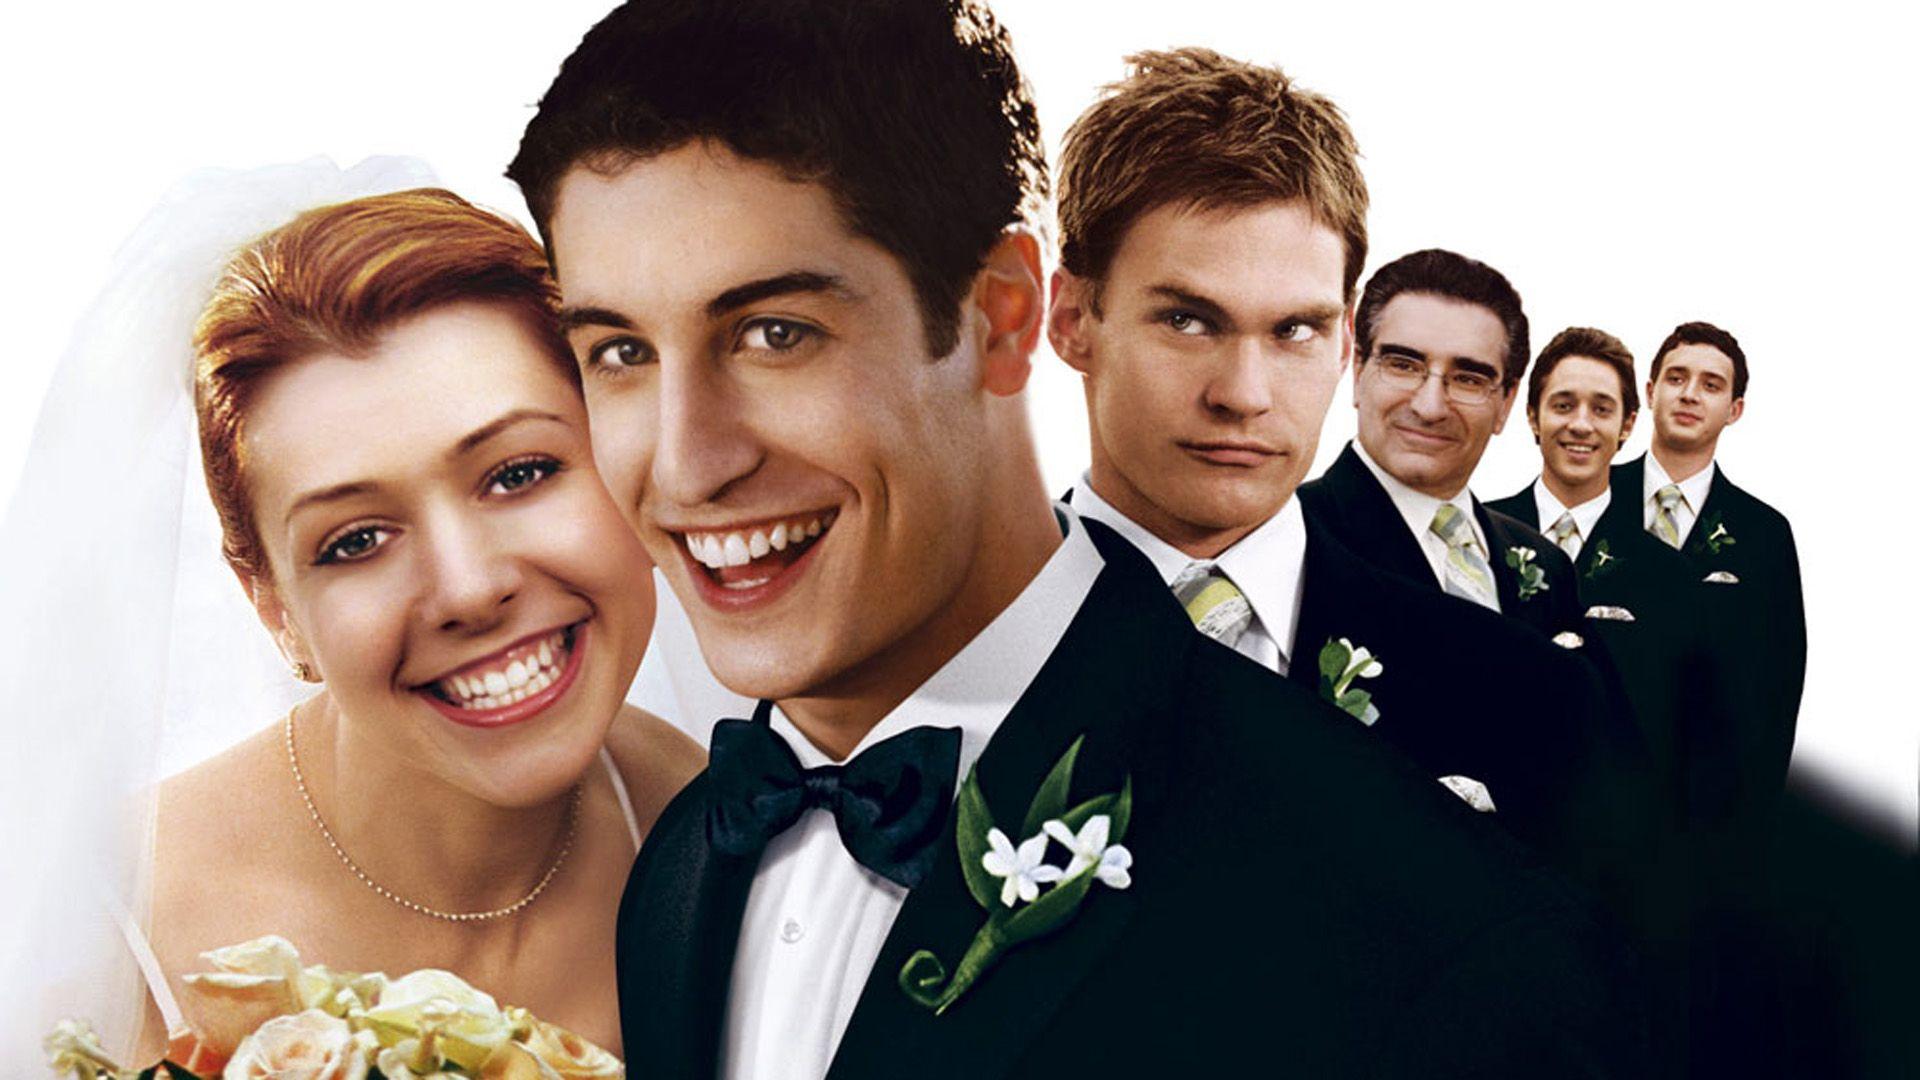 American pie 3 full movie free